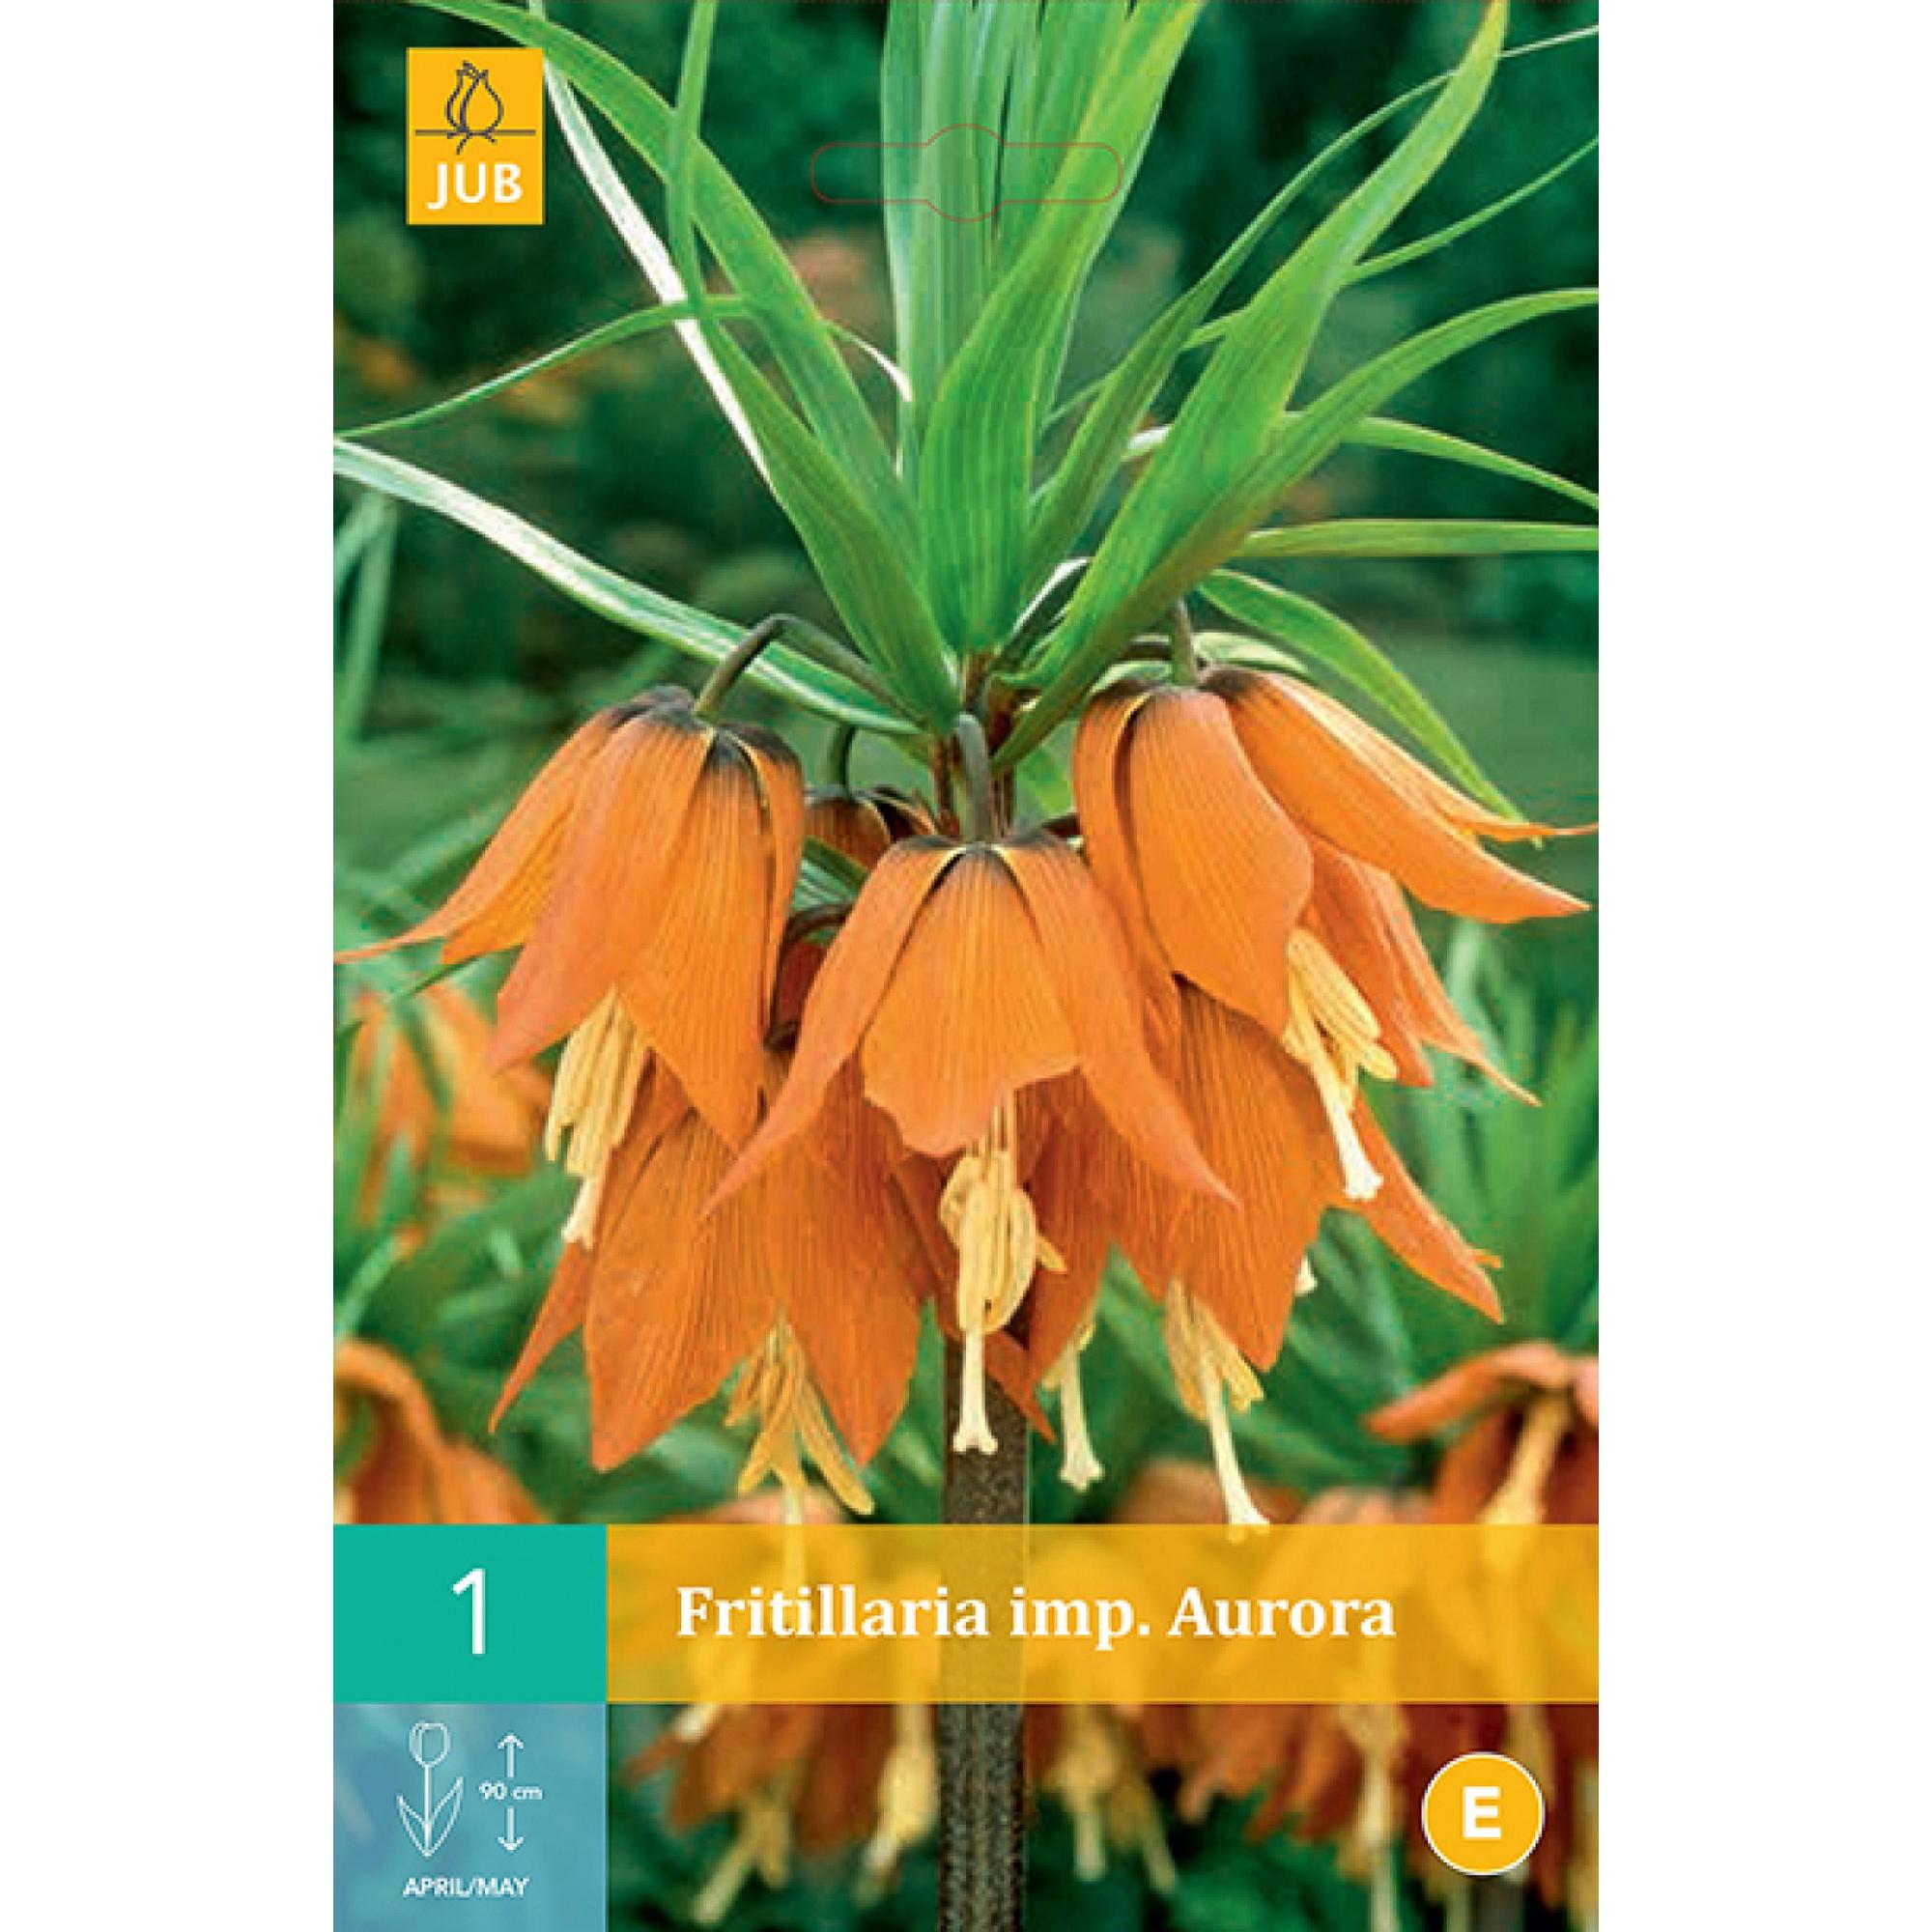 Рябчик JUB (Fritillaria) imp. Aurora 1 шт